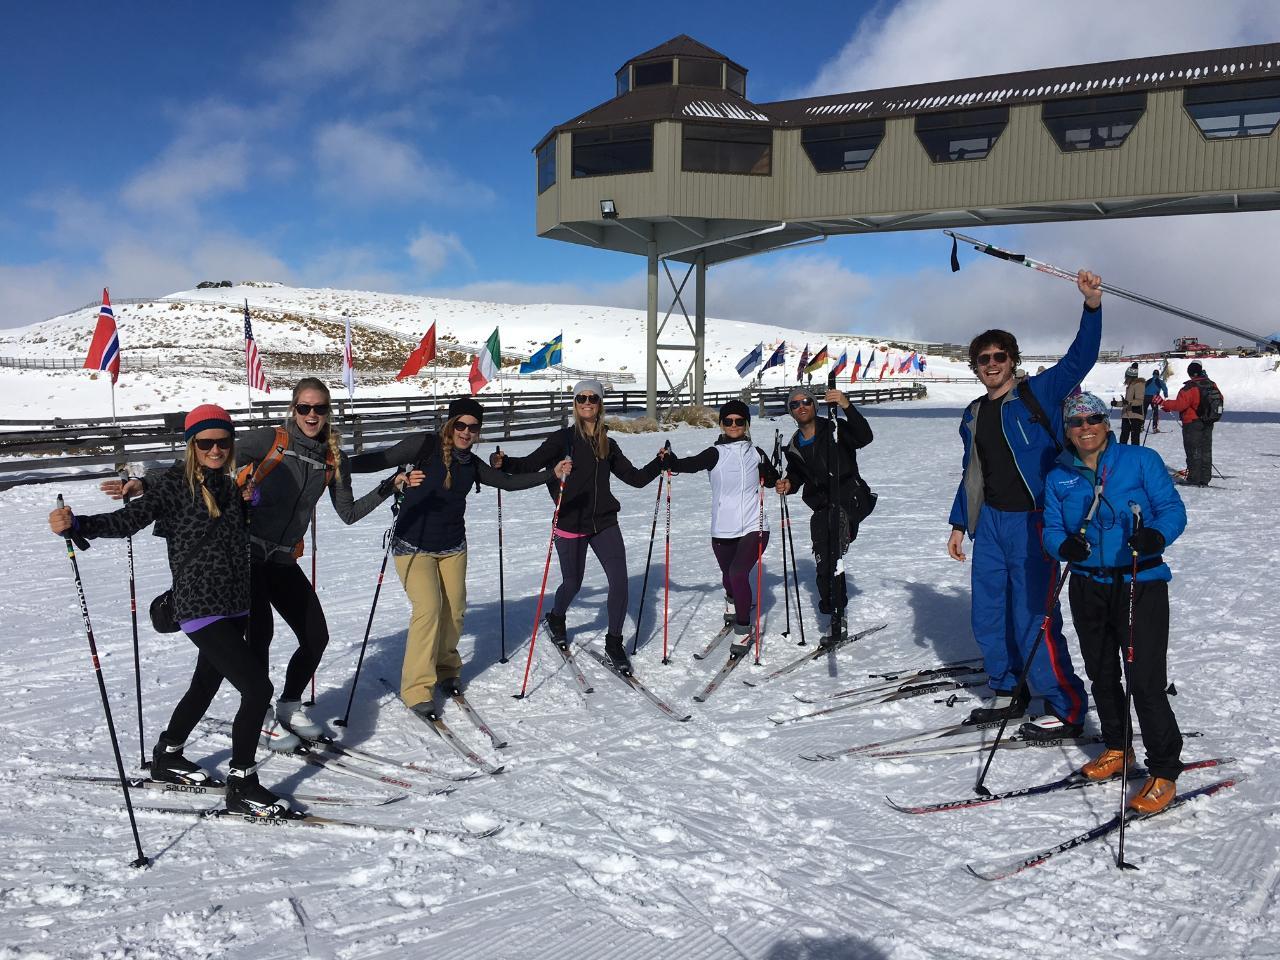 Half-Day Cross-Country Ski Experience